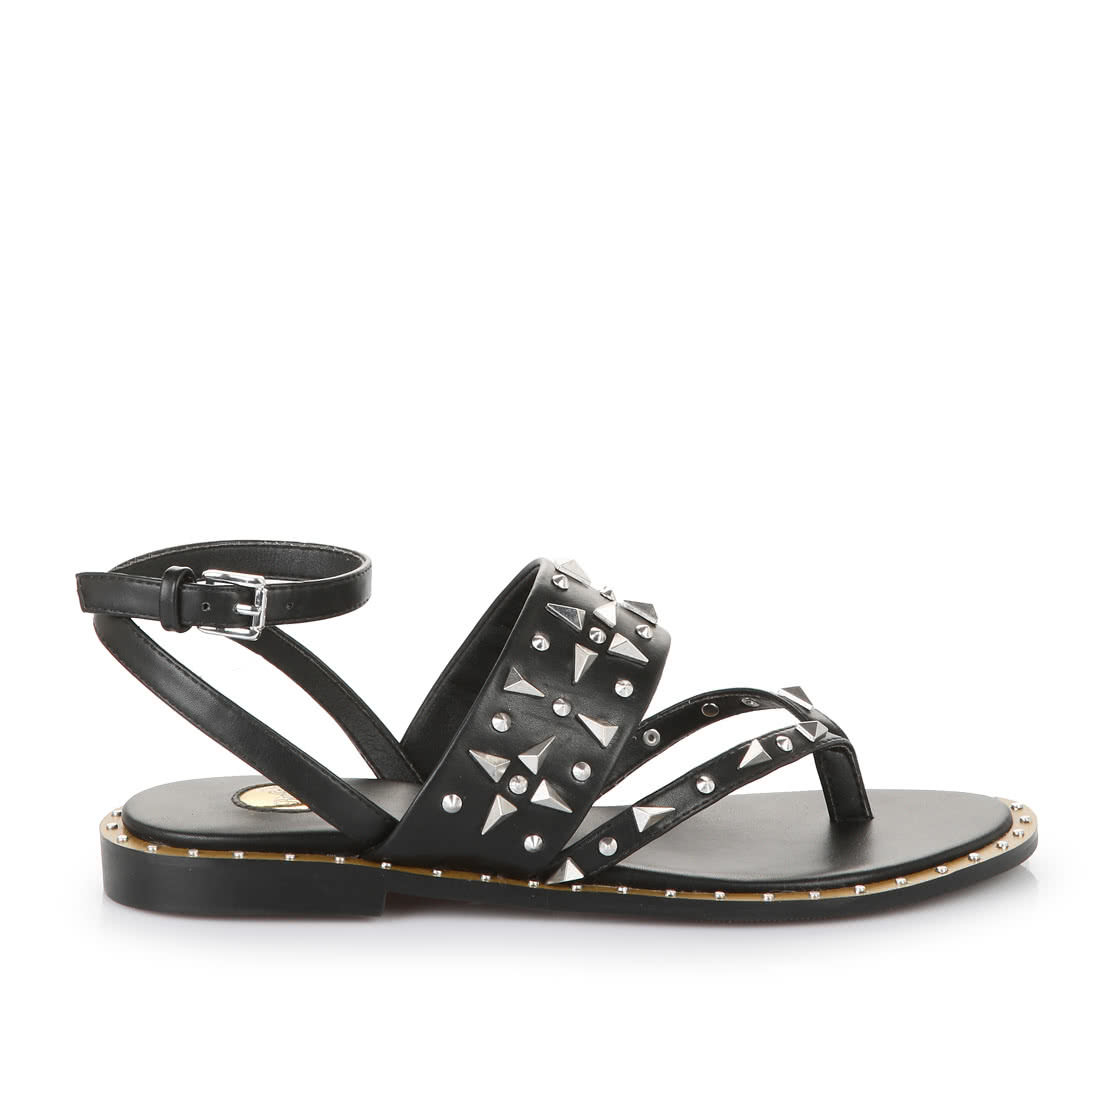 db0d925b5 Buffalo flip flop sandals in black with studs buy online in BUFFALO ...